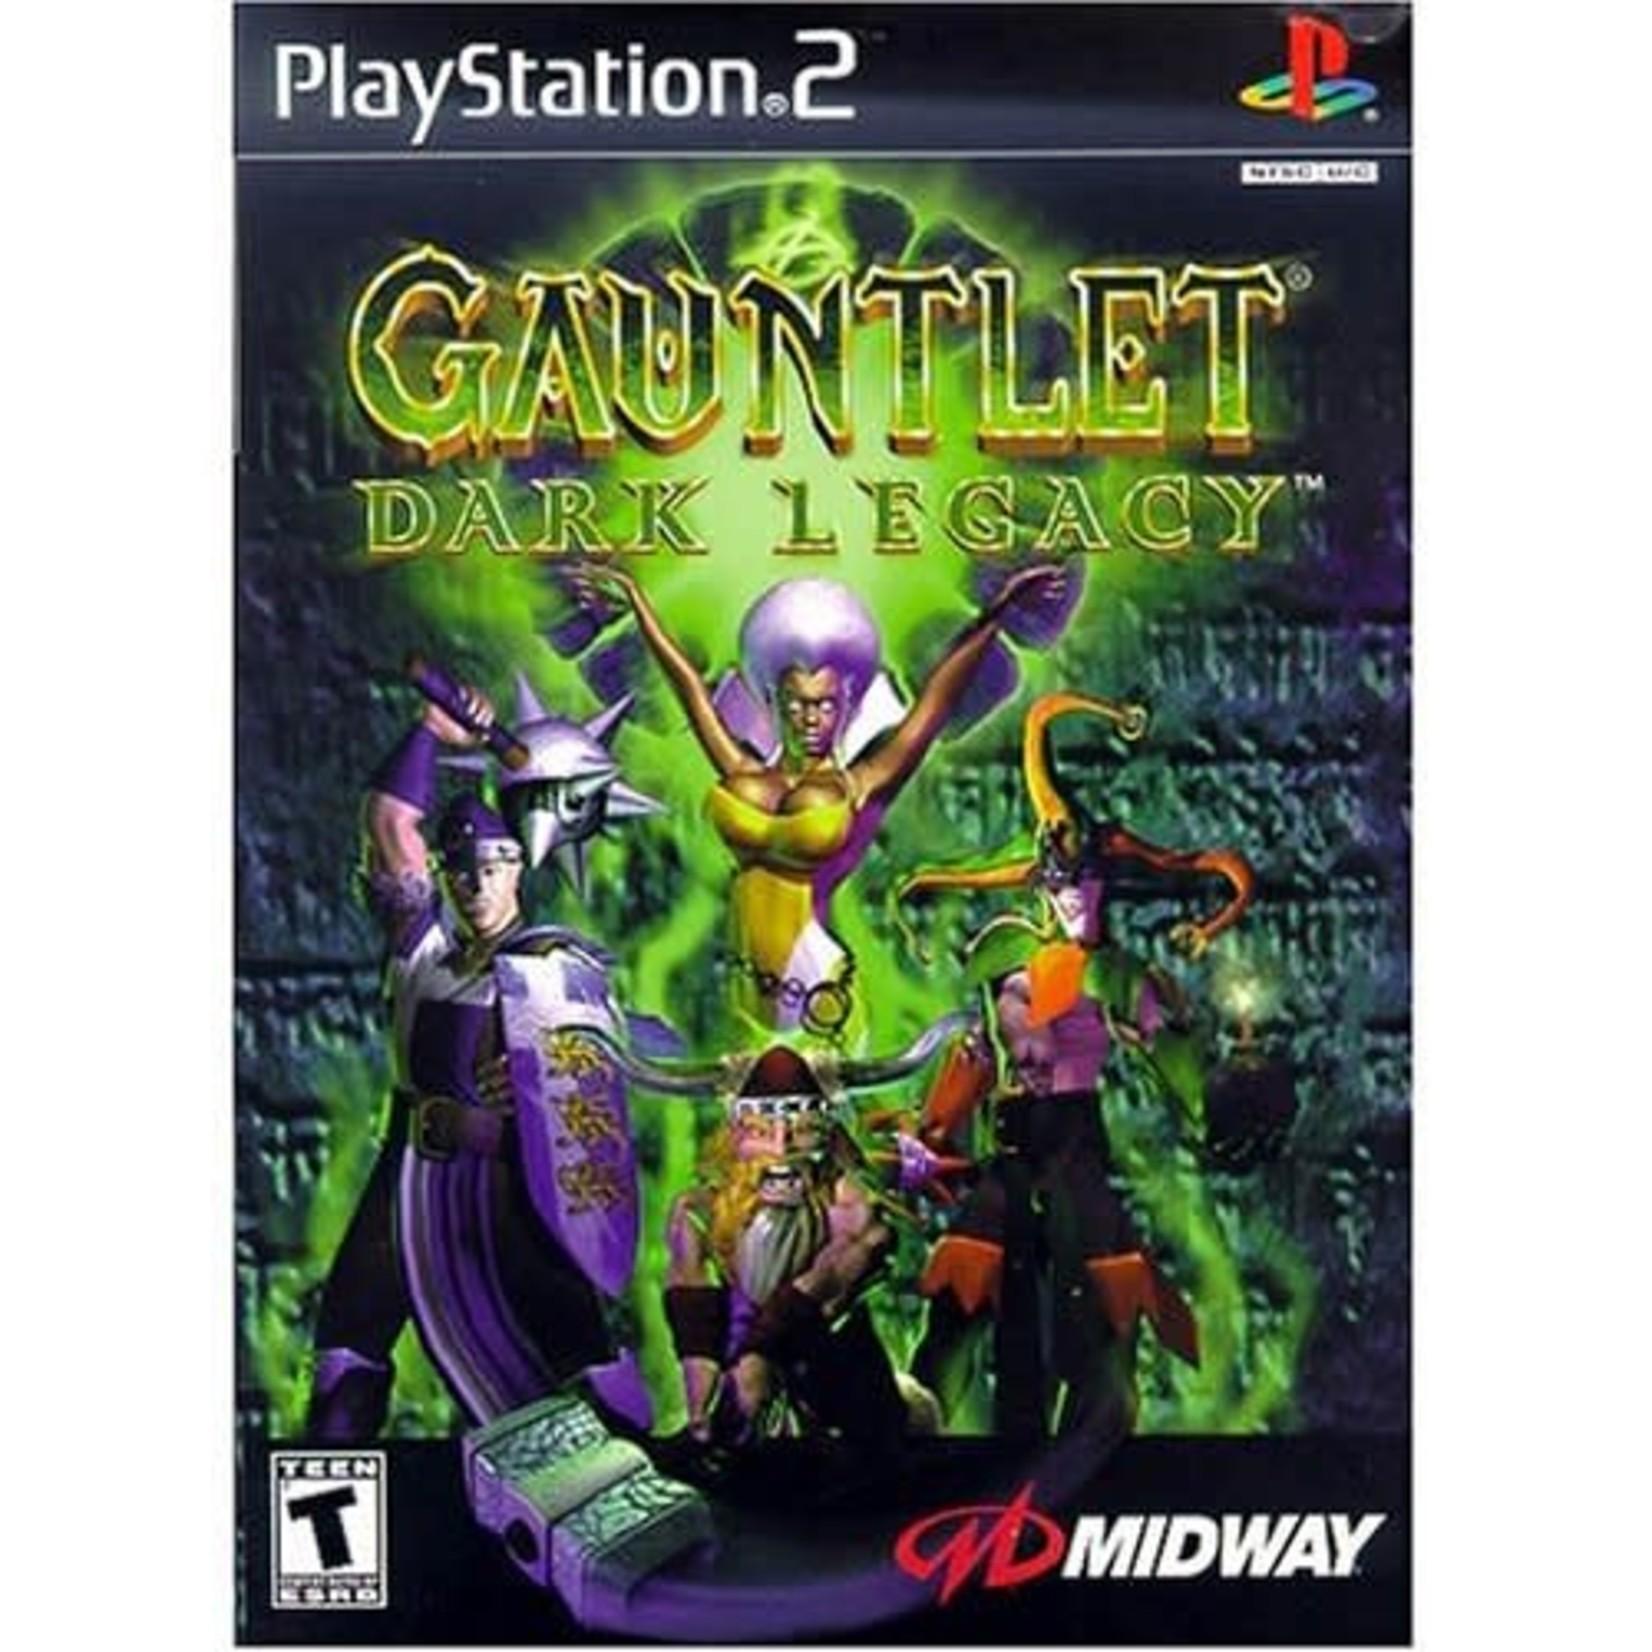 ps2u-Gauntlet Dark Legacy